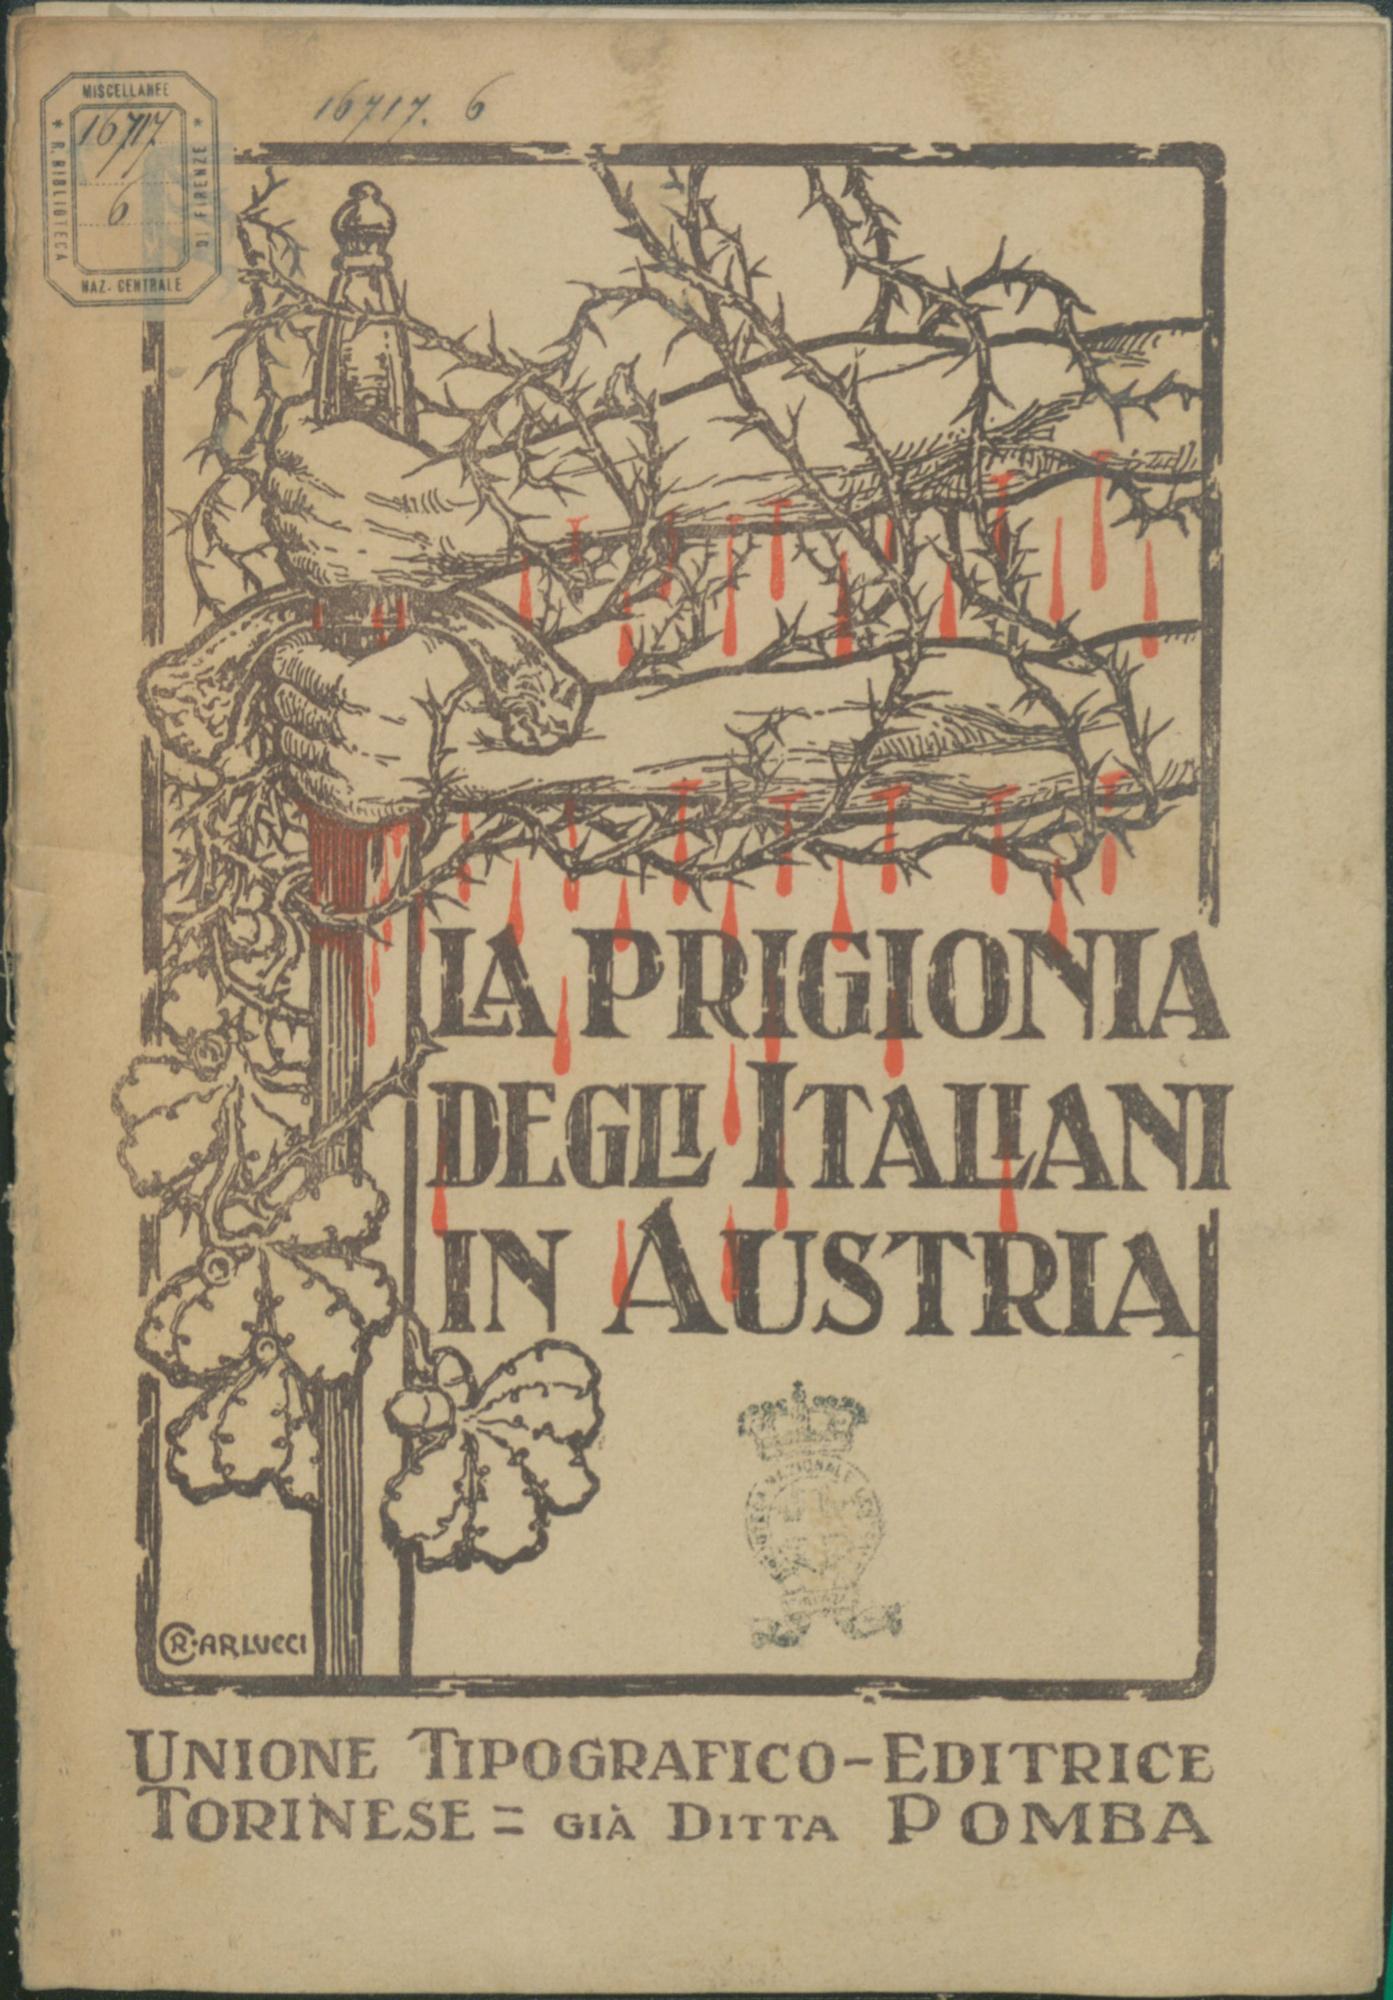 Italian prisoners of war in Austria: impressions and memories